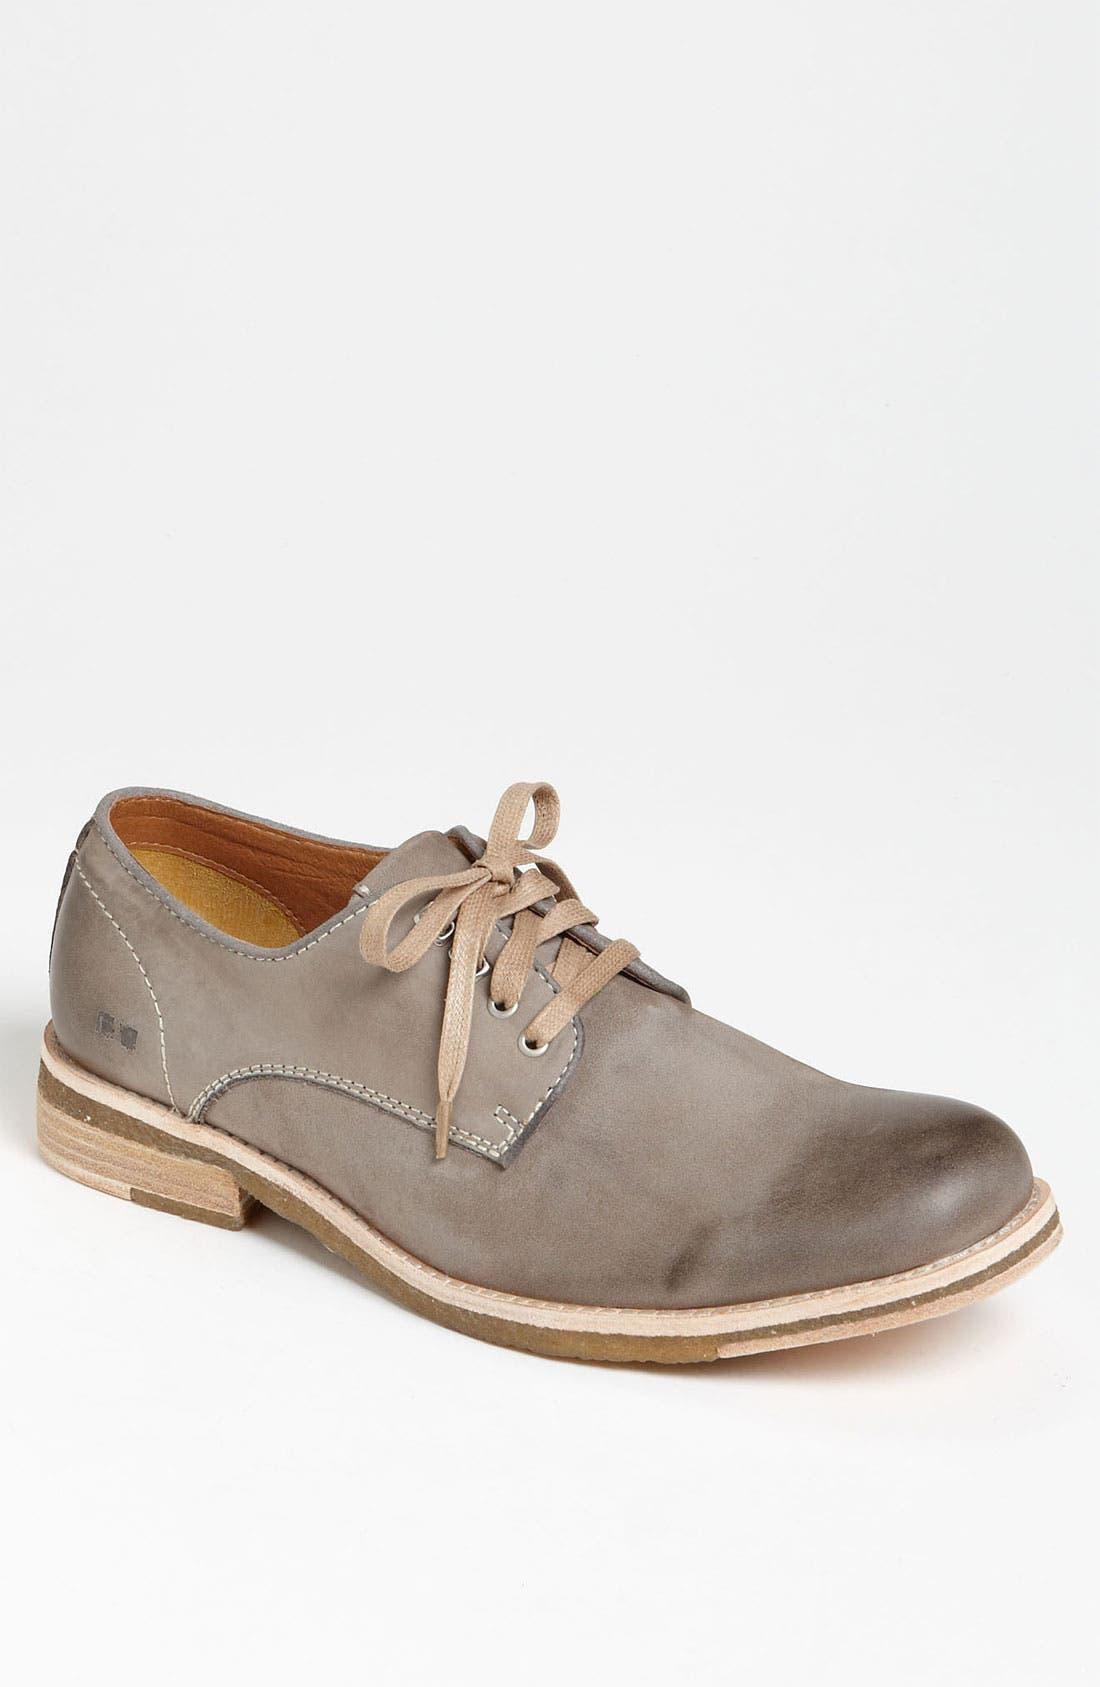 Alternate Image 1 Selected - Bed Stu 'Pennyworth' Buck Shoe (Online Only)